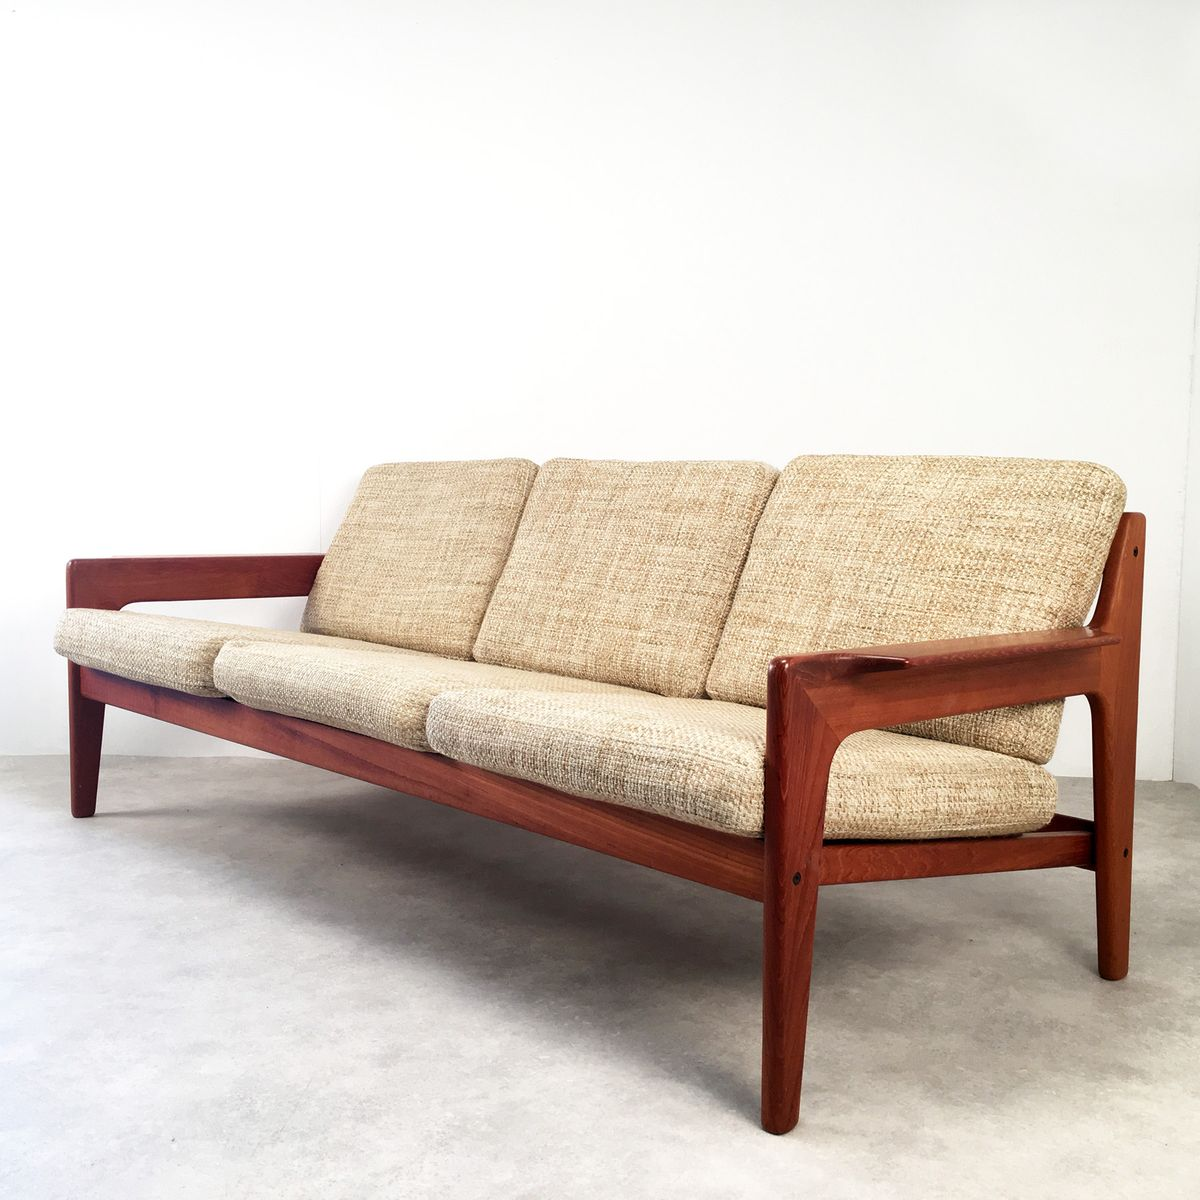 Mid Century Danish Three Seater Sofa By Arne Wahl Iversen For Komfort 1960s